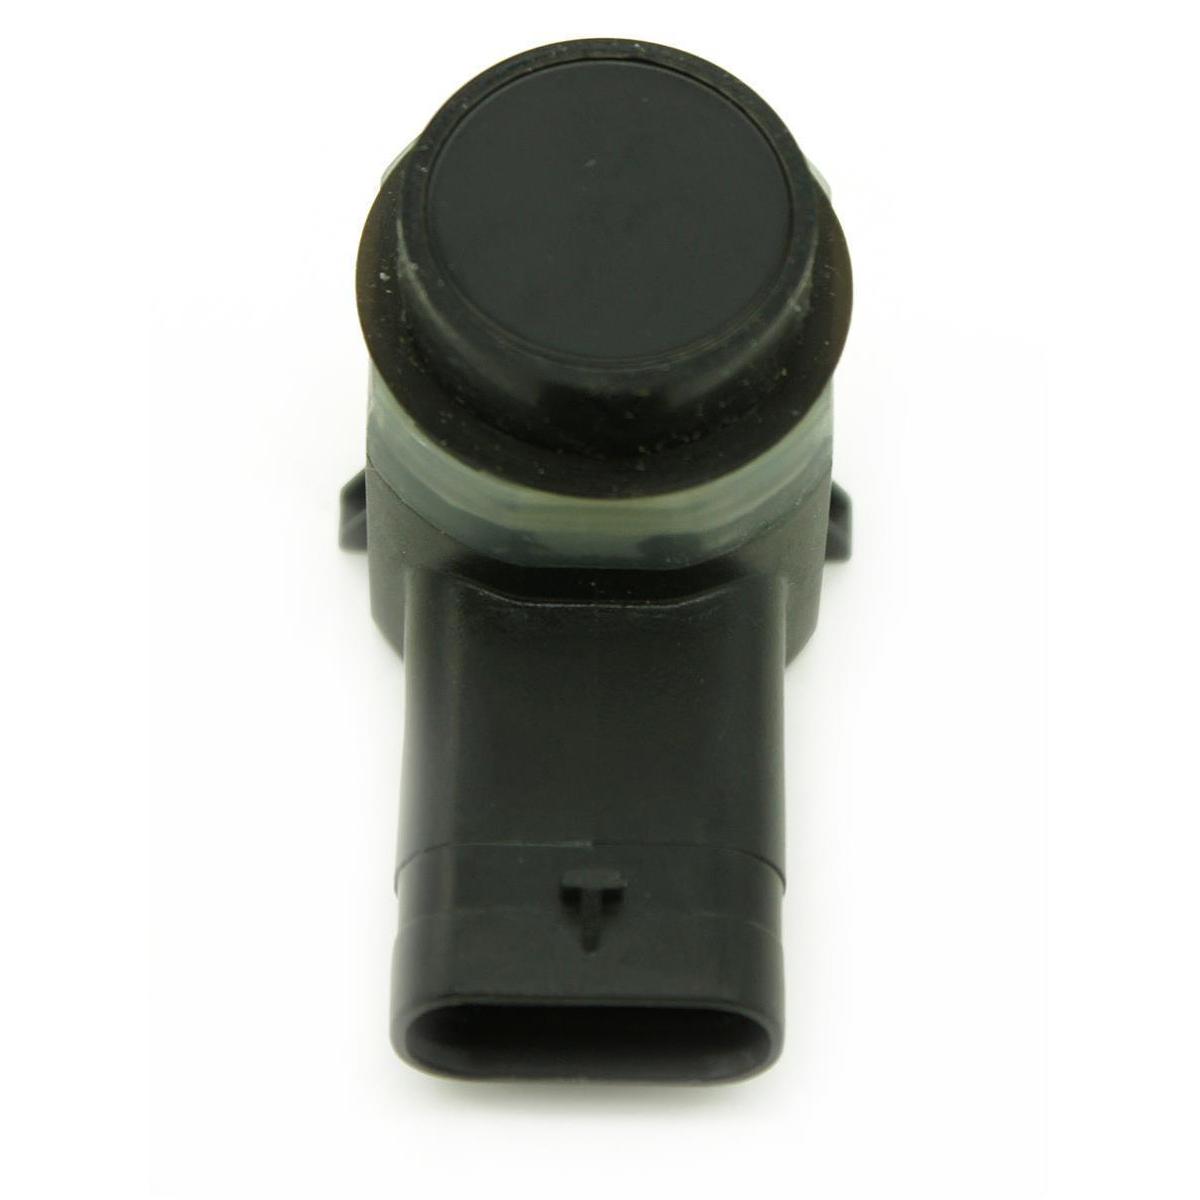 Park sensor LR040927 for Land Rover PDC Parktronic